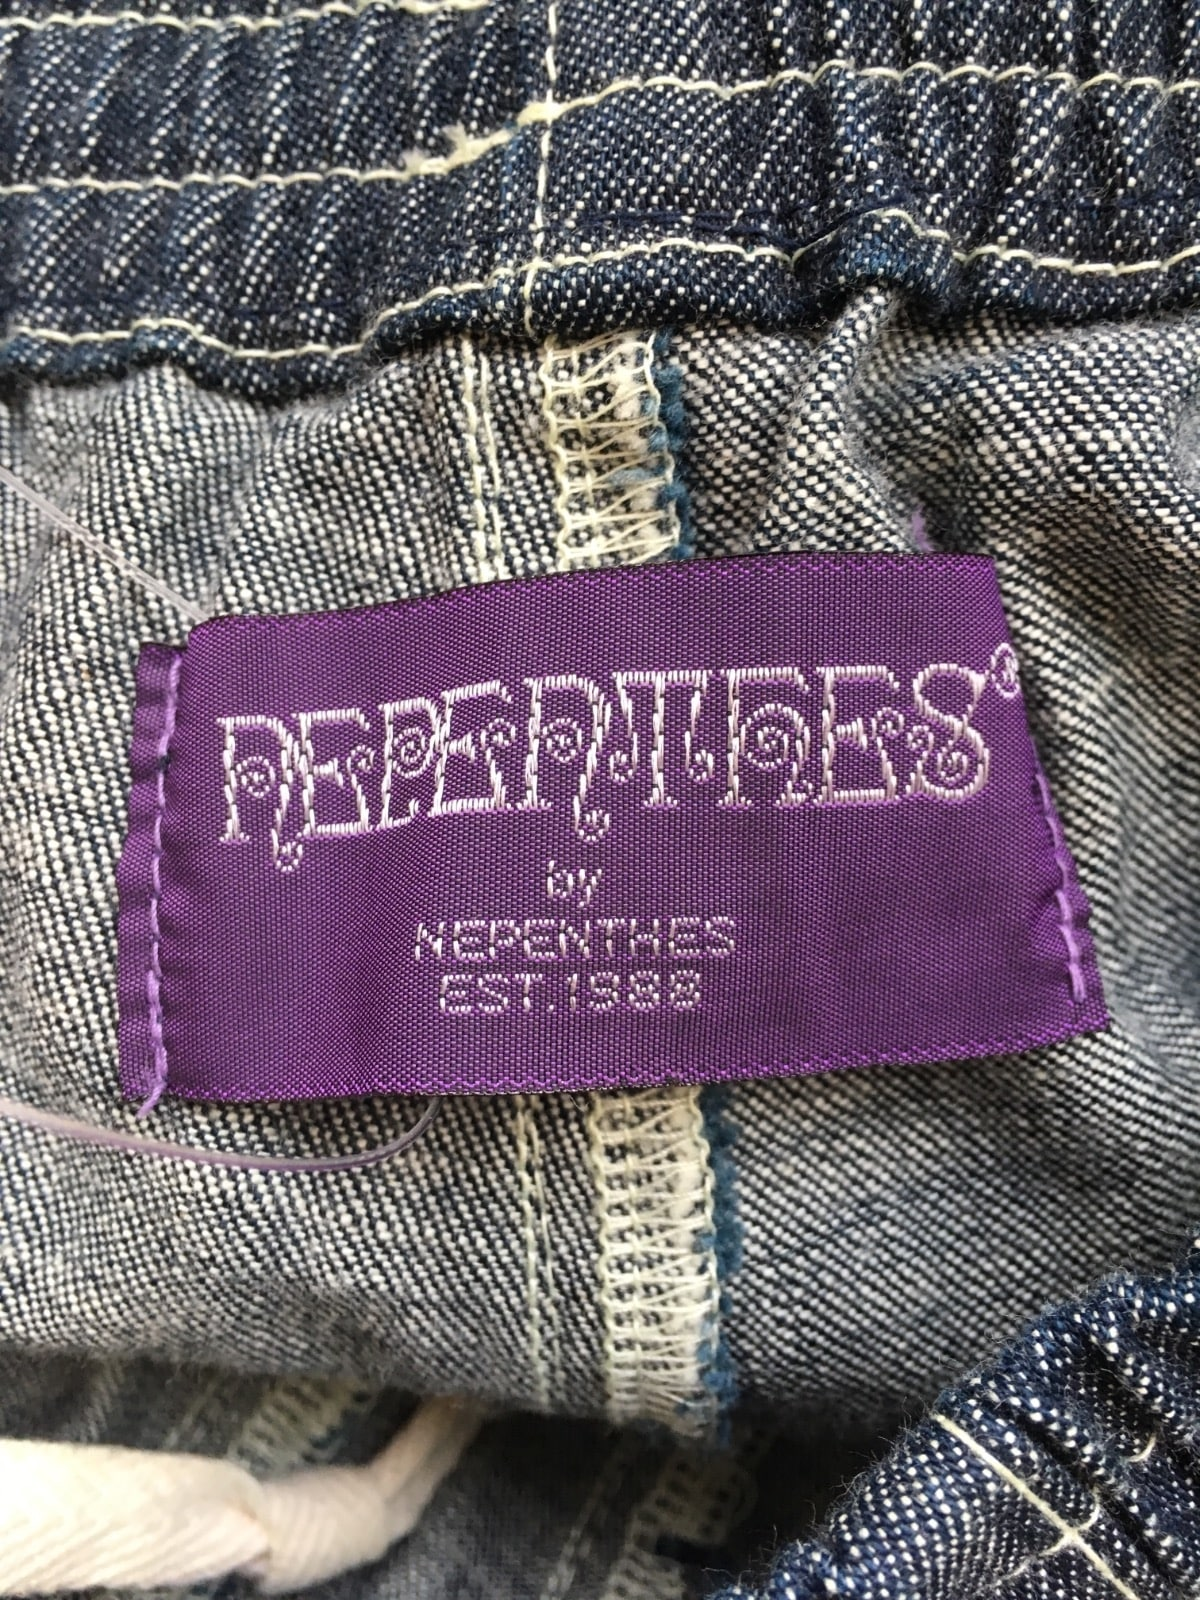 NEPENTHES(ネペンテス)のパンツ